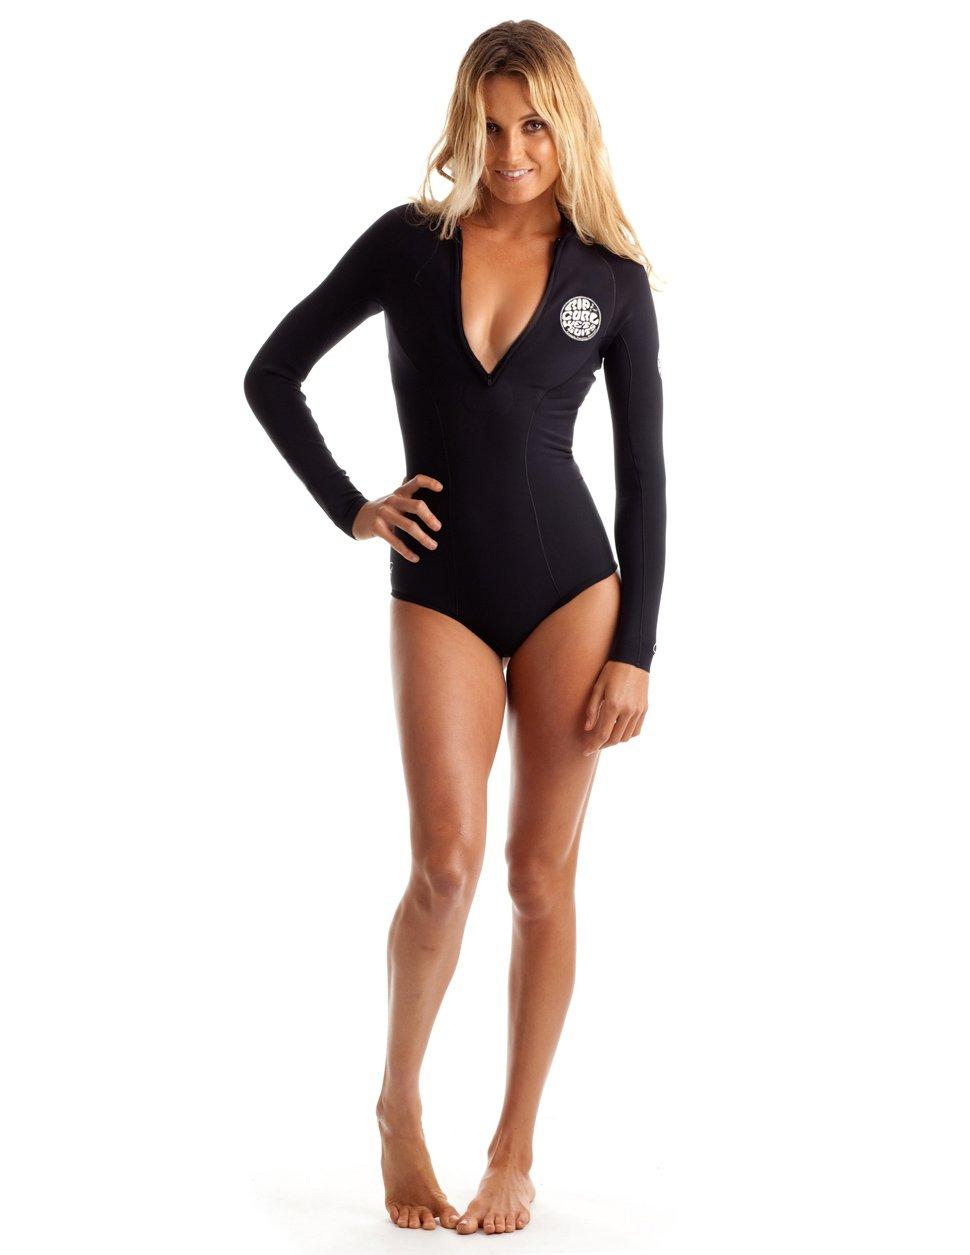 Rip Curl G Bomb Long Sleeve Spring Suit Hi Cut, Black/Black, Size 4